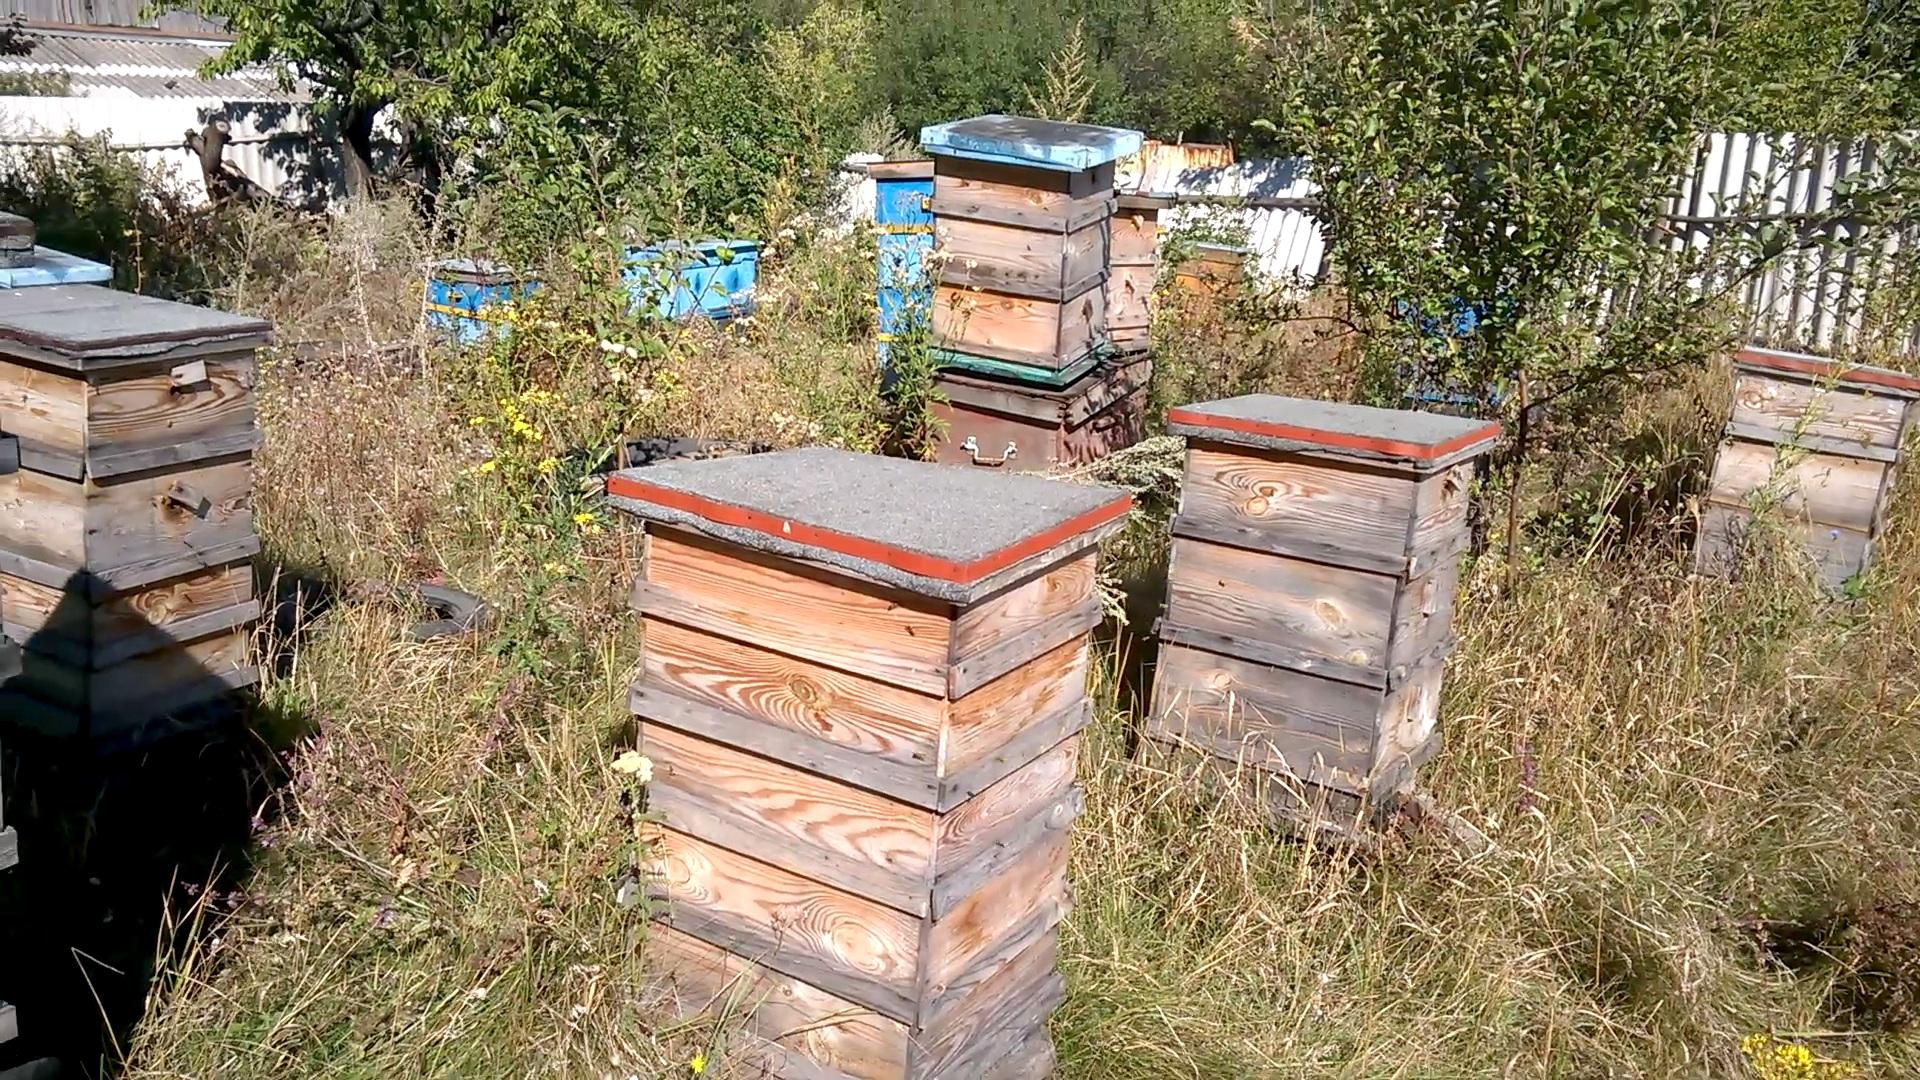 Осы атакуют пчелиный улей. Wasps are attacking beehive